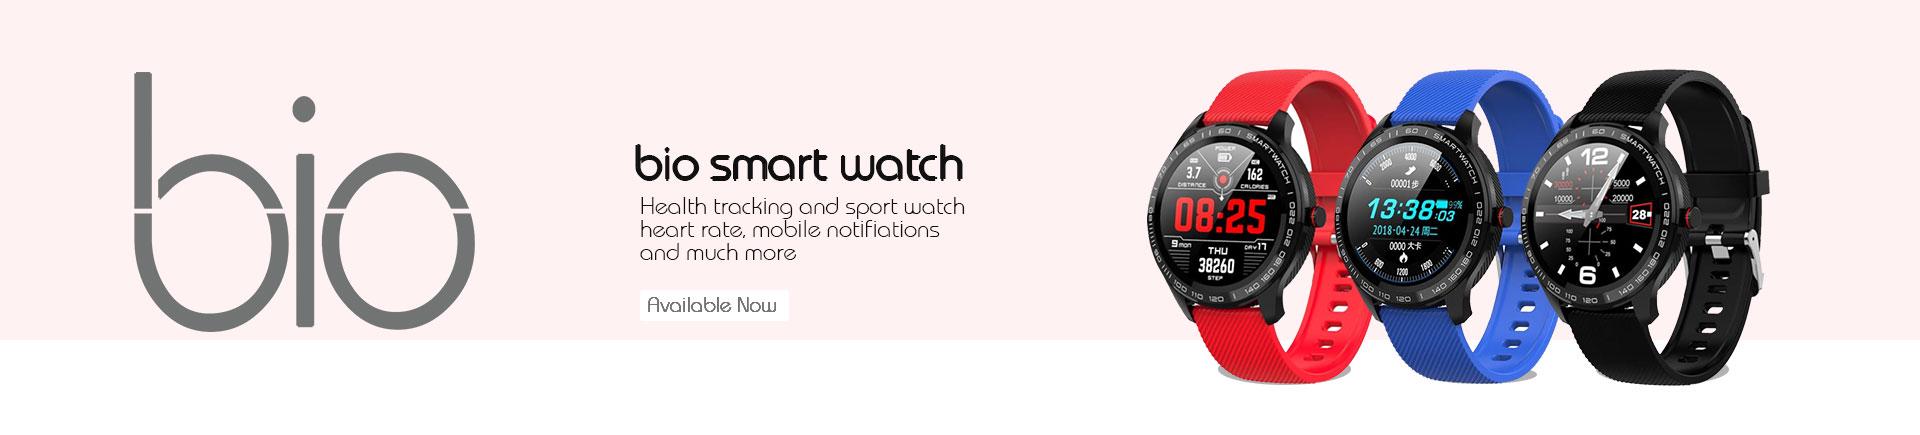 Bio Smart Watch